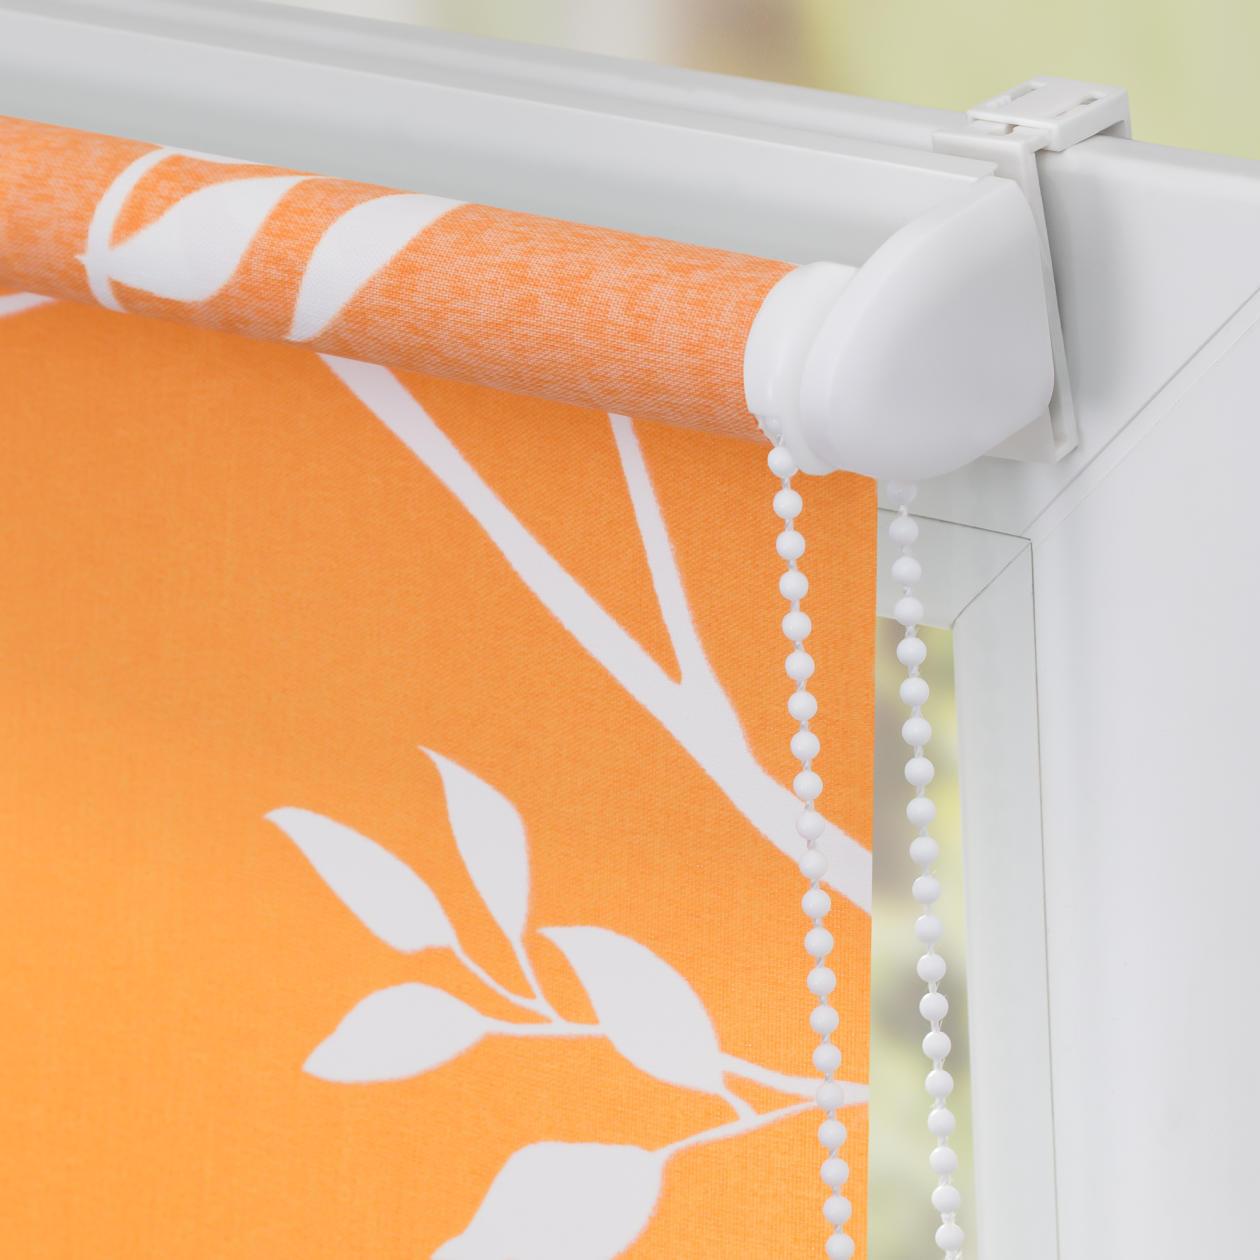 rollo klemmfix ohne bohren blickdicht ficus orange wei lichblick shop. Black Bedroom Furniture Sets. Home Design Ideas